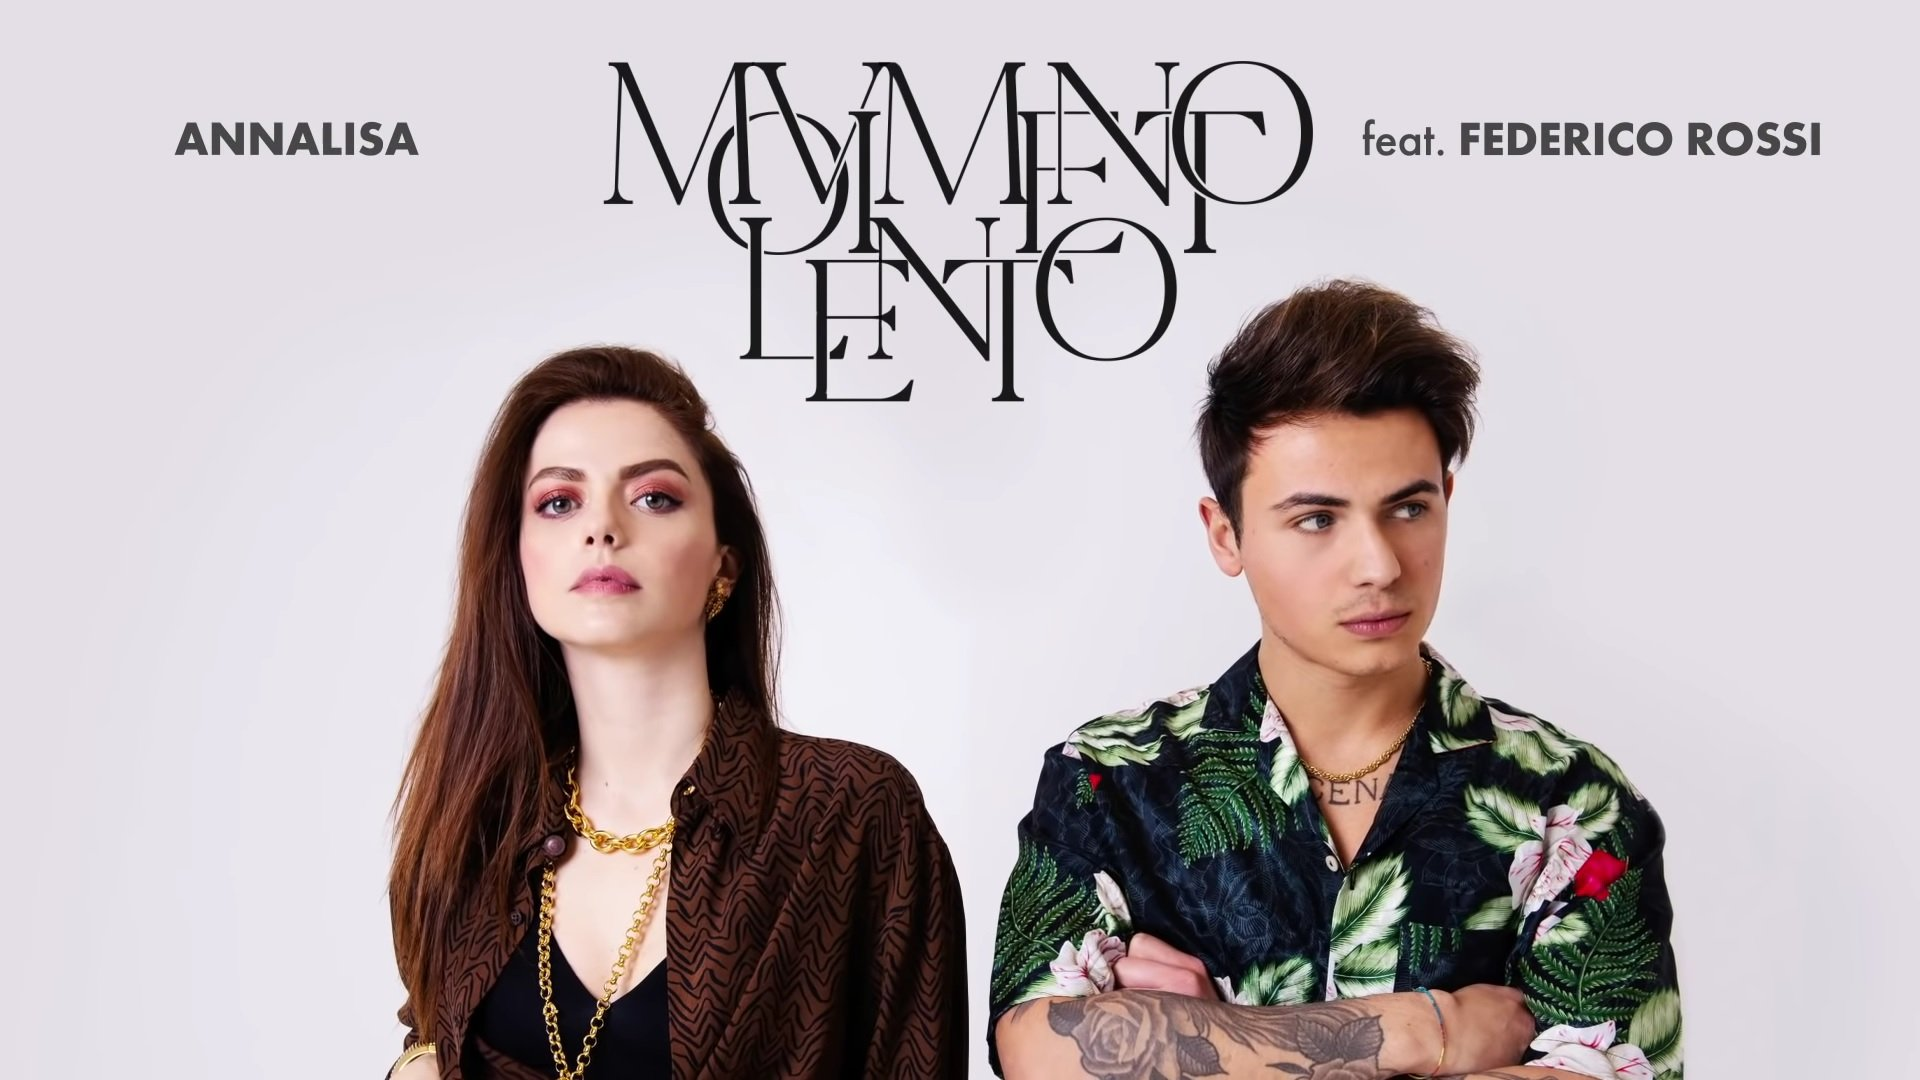 Annalisa Movimento lento feat. Federico Rossi